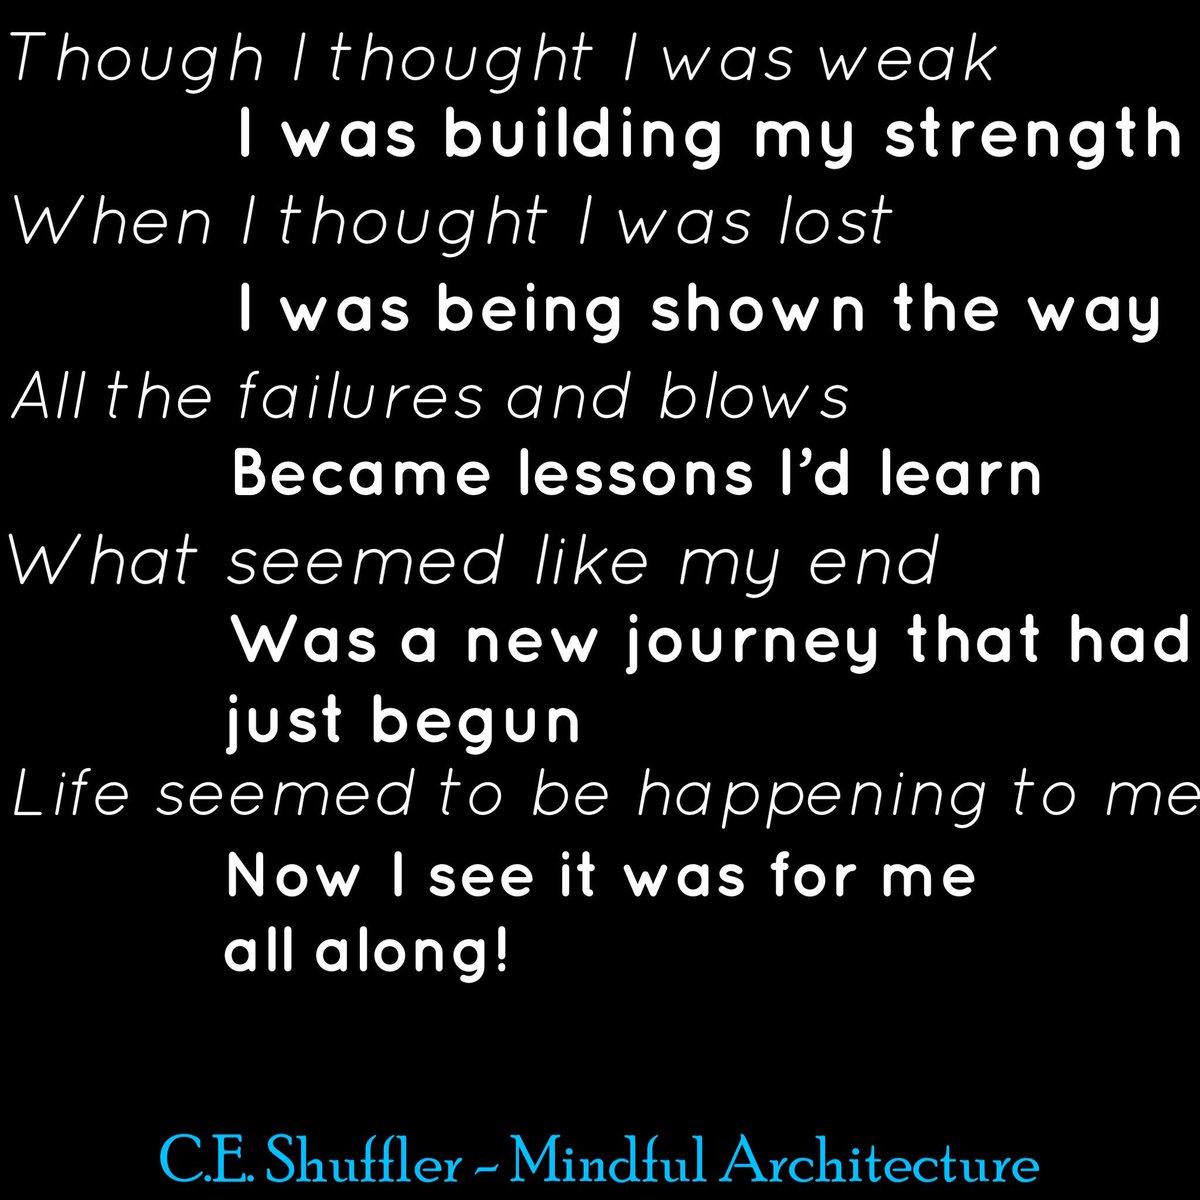 Things in this journey called life aren't always what they seem! Enjoiyvthe journey!!#thegoodcommunity #pma #positiventalattitude #positivemindset #compassion #positivethinking #perspective  @GoodCommunity_<br>http://pic.twitter.com/3i6PgeV115